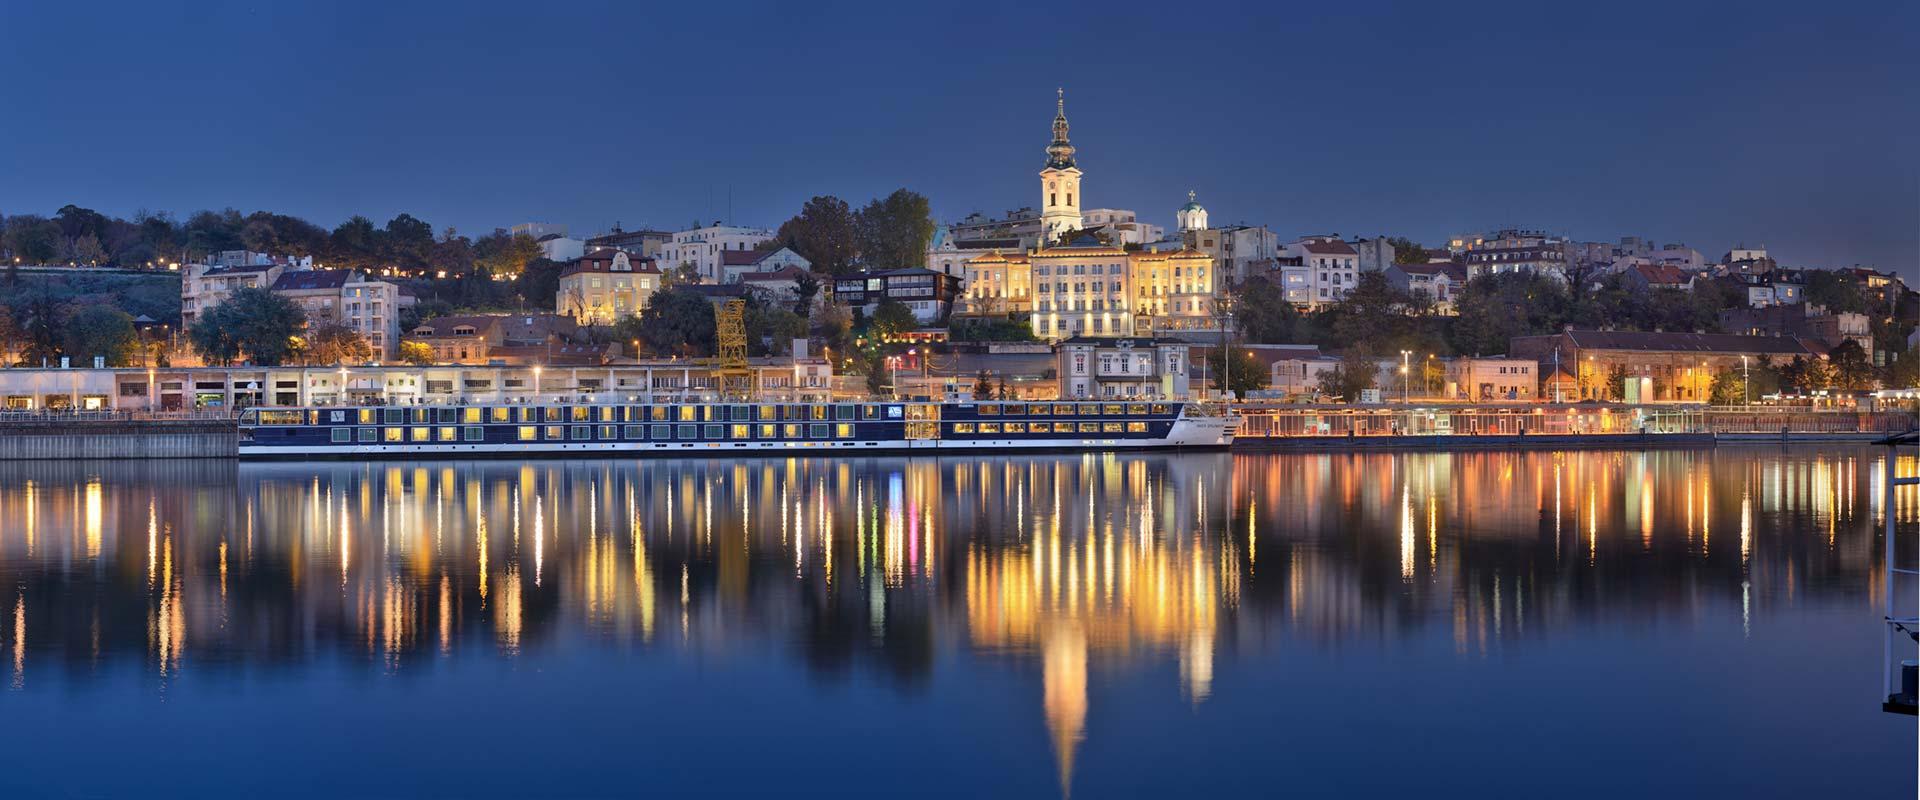 Riverside view, photo Dragan Obrić